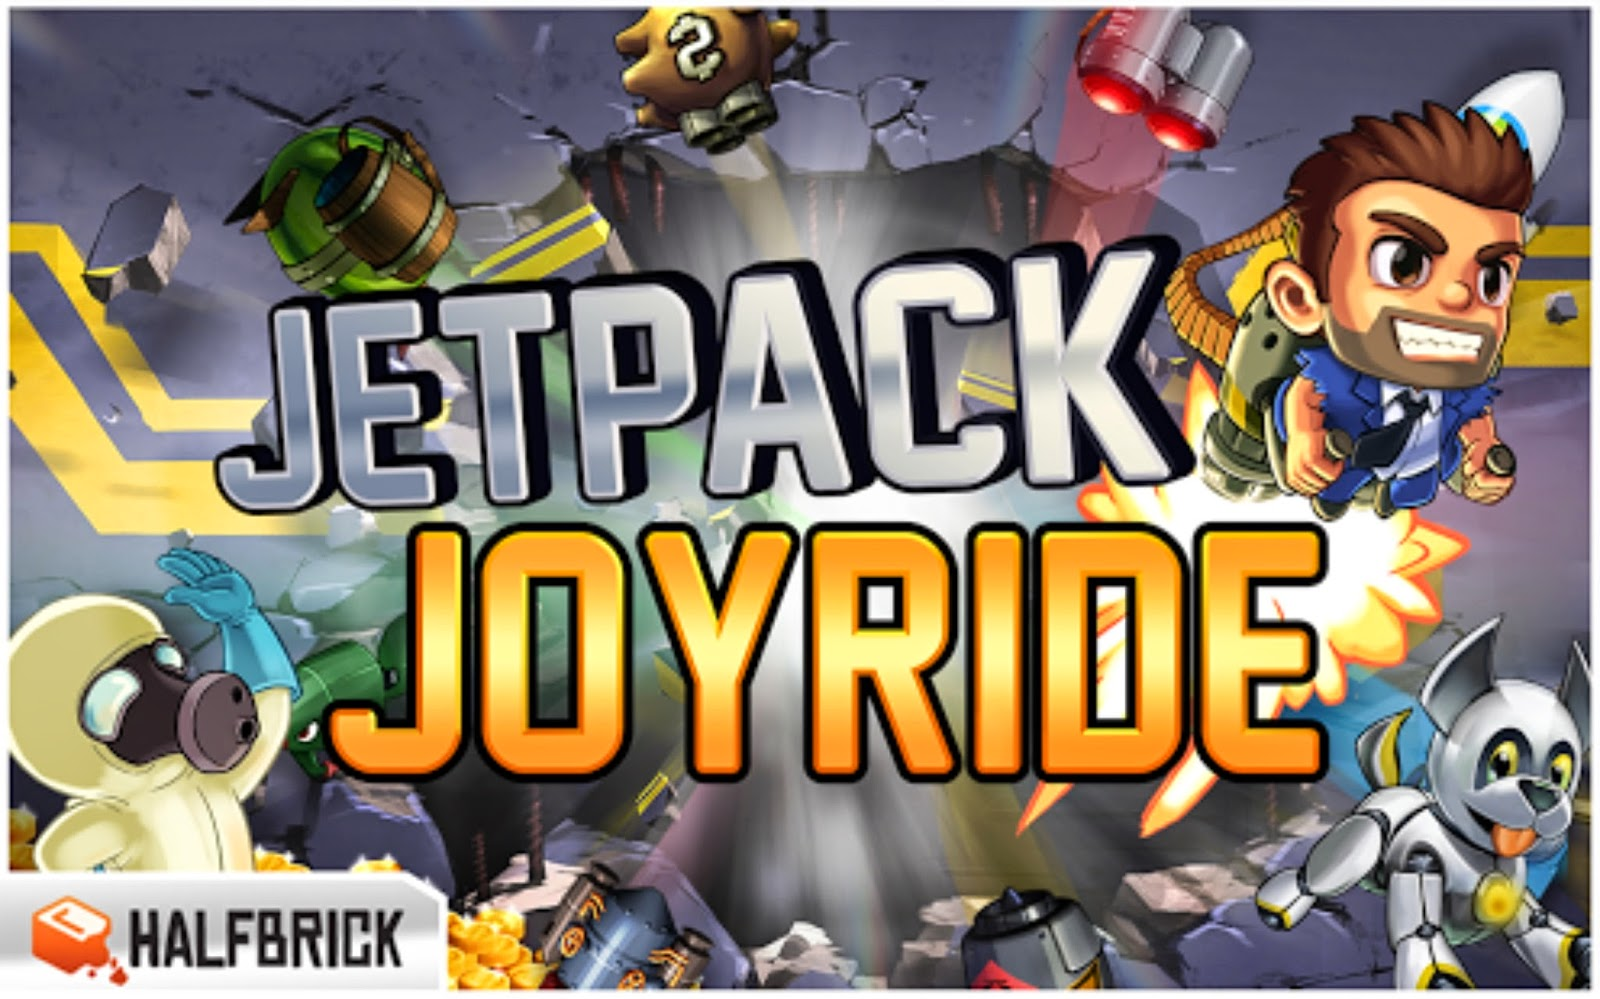 Jetpack Joyride Apk Android